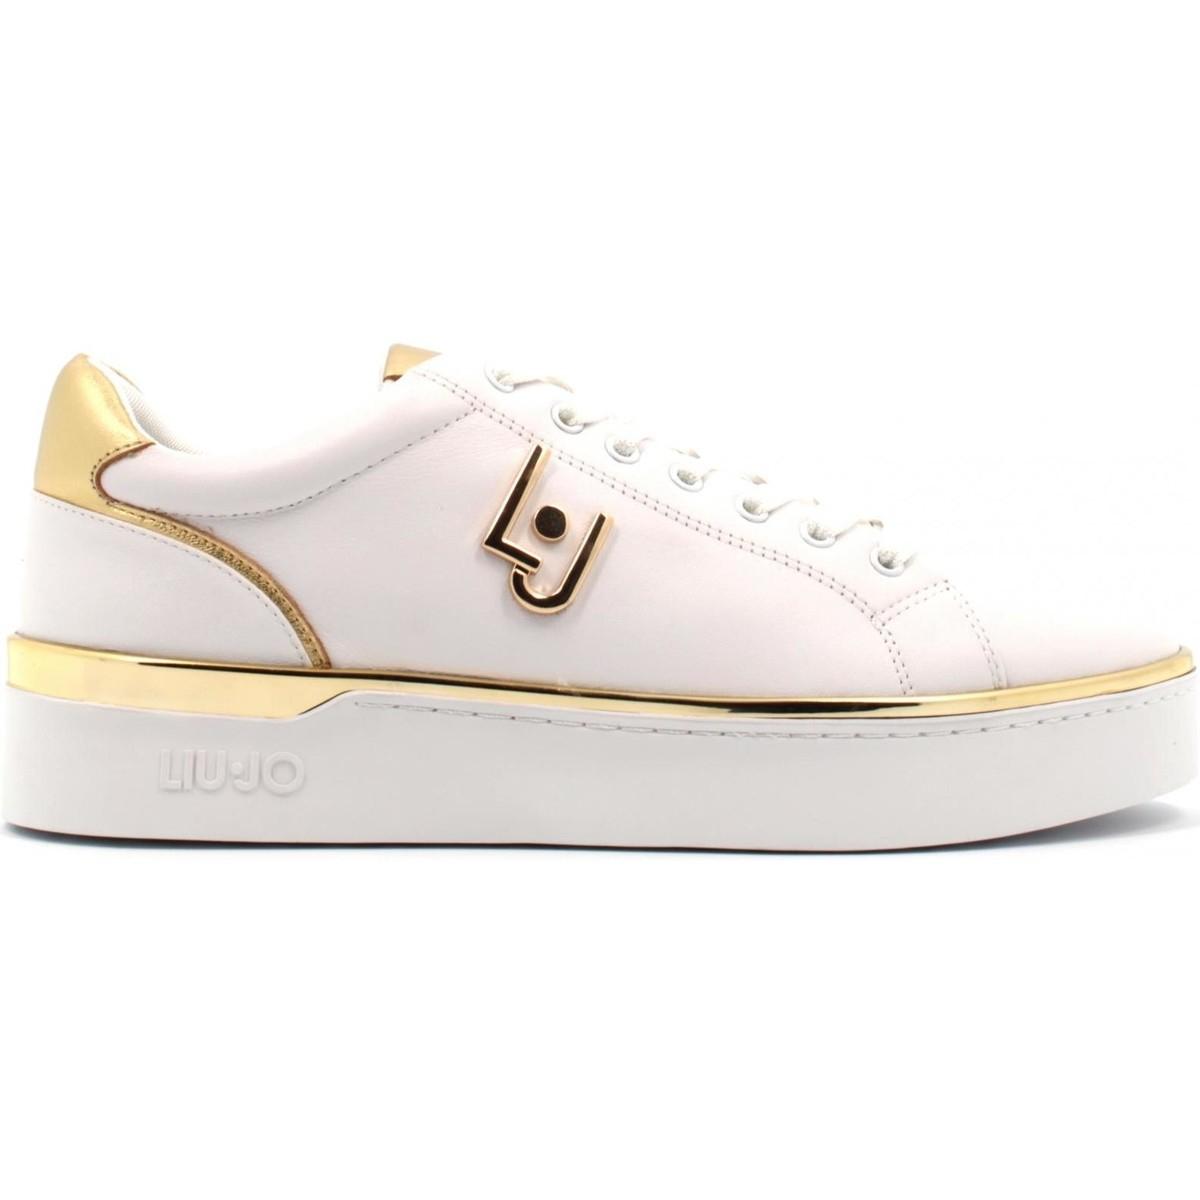 rif112ab1 scarpe donna liu jo sneaker mod. silvia in pelle